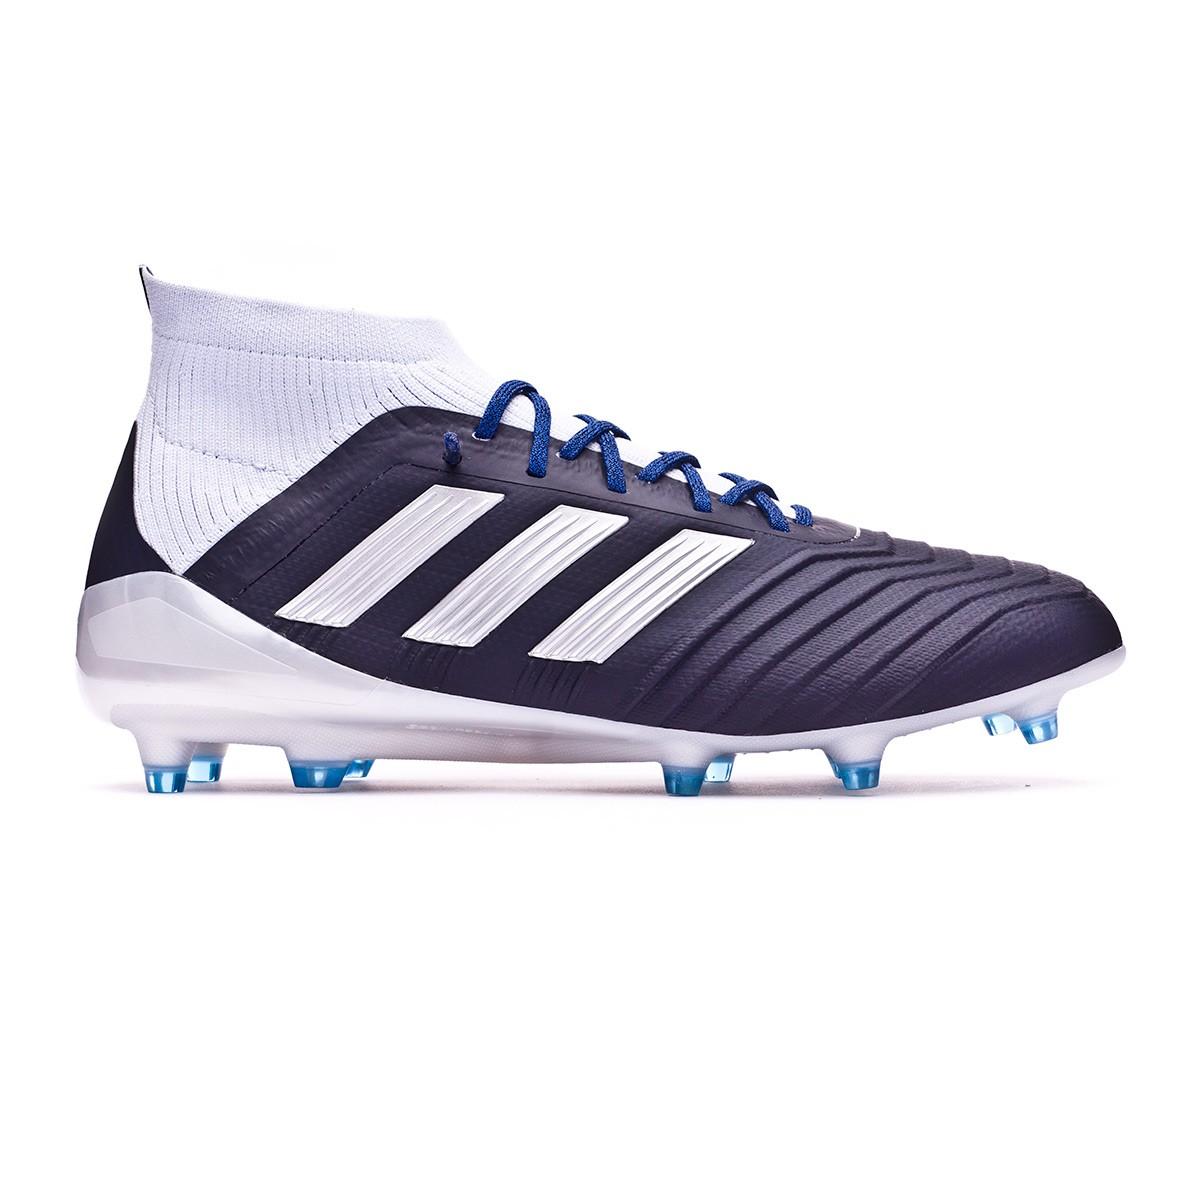 0b6b6e31a Football Boots adidas Woman Predator 18.1 FG Legend ink-Silver metallic-Aero  blue - Football store Fútbol Emotion